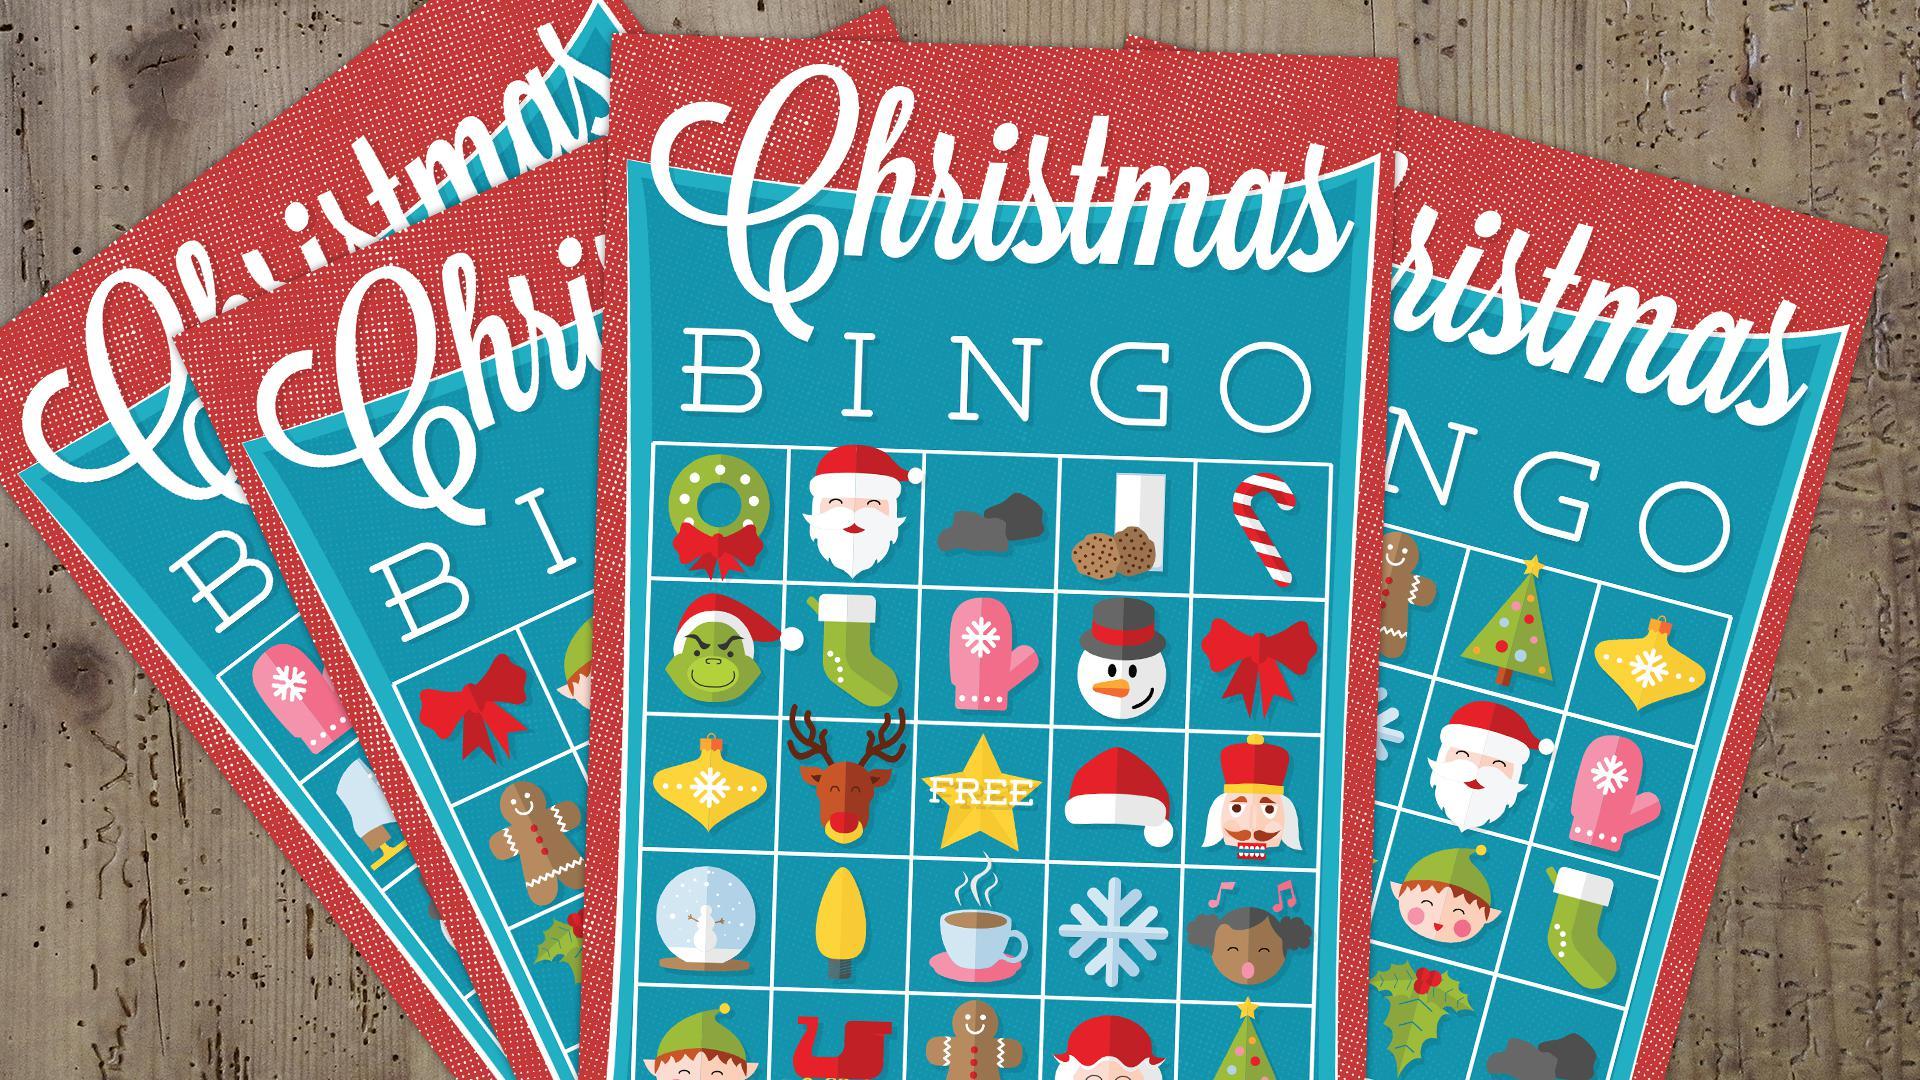 graphic about Printable Christmas Bingo Game called Xmas bingo match printable with 3 twists upon the